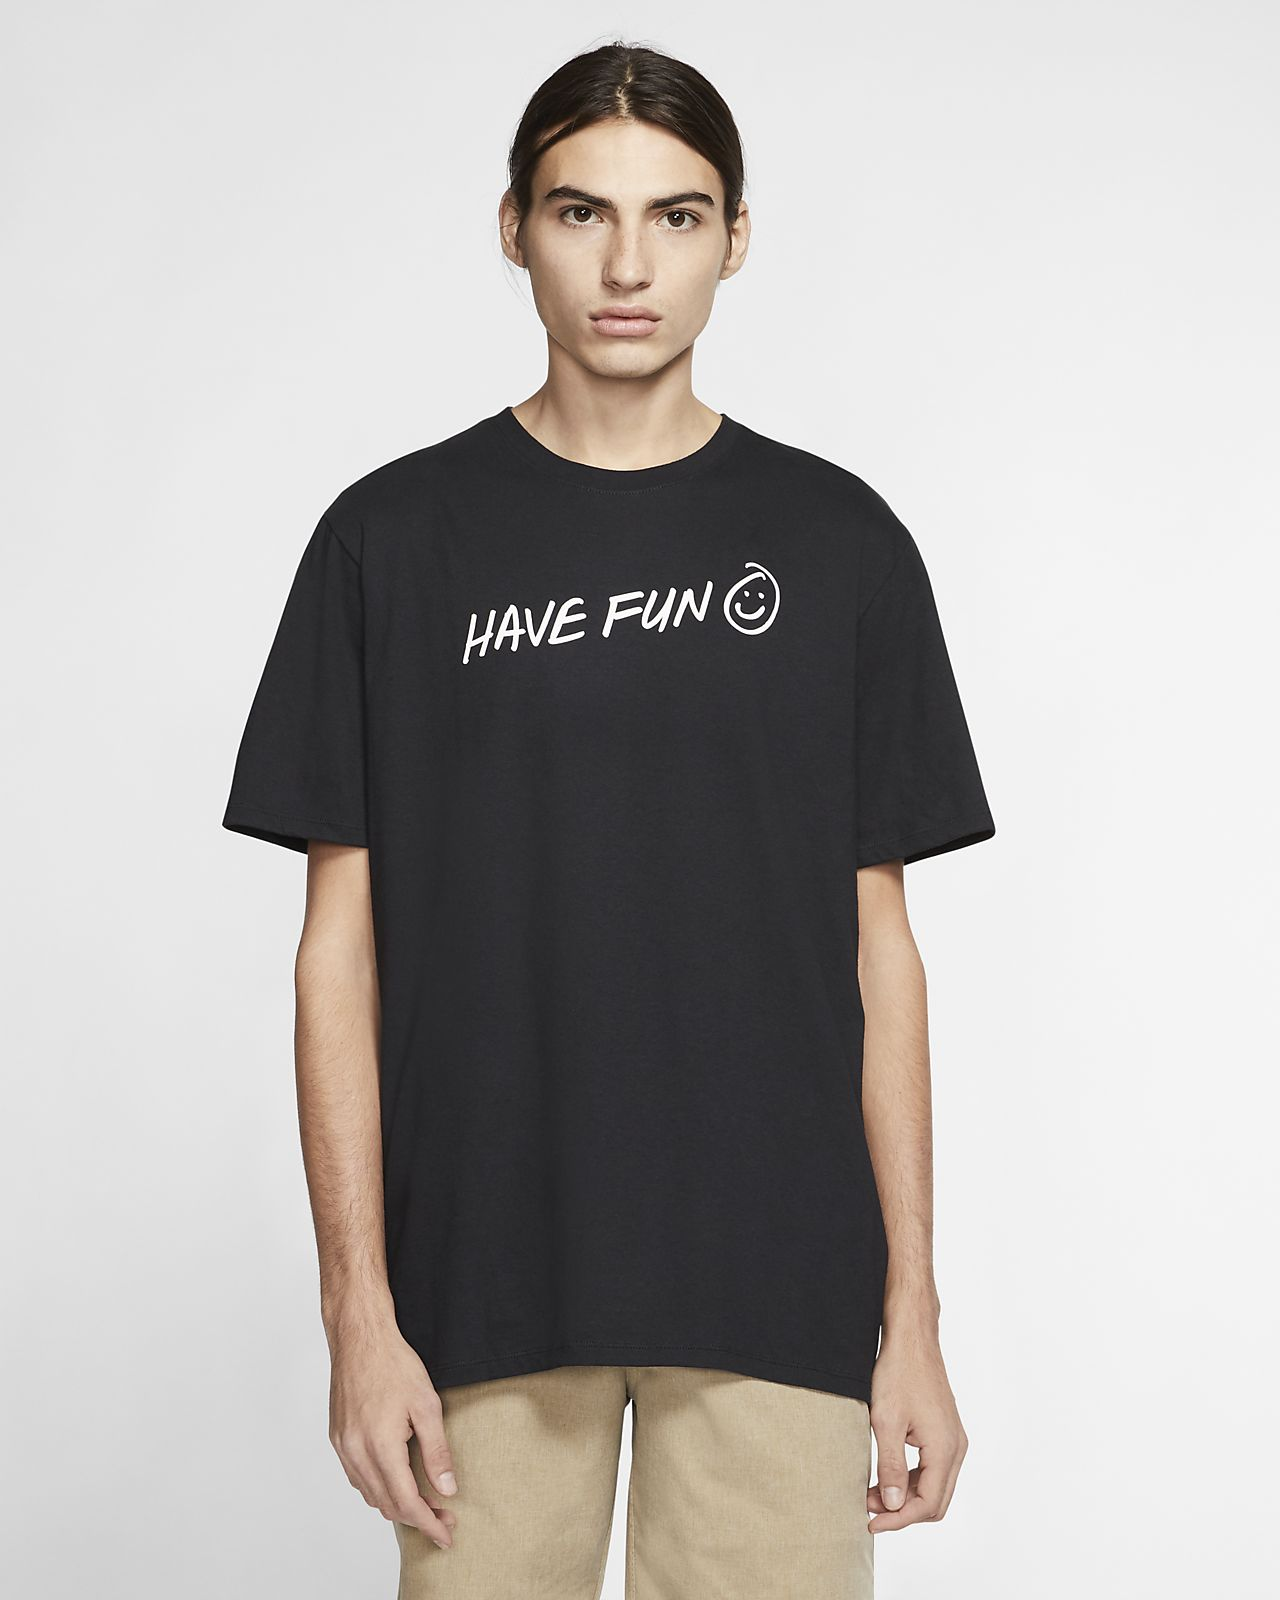 HURLEY  HAVE FUN T-SHIRT- BLACK